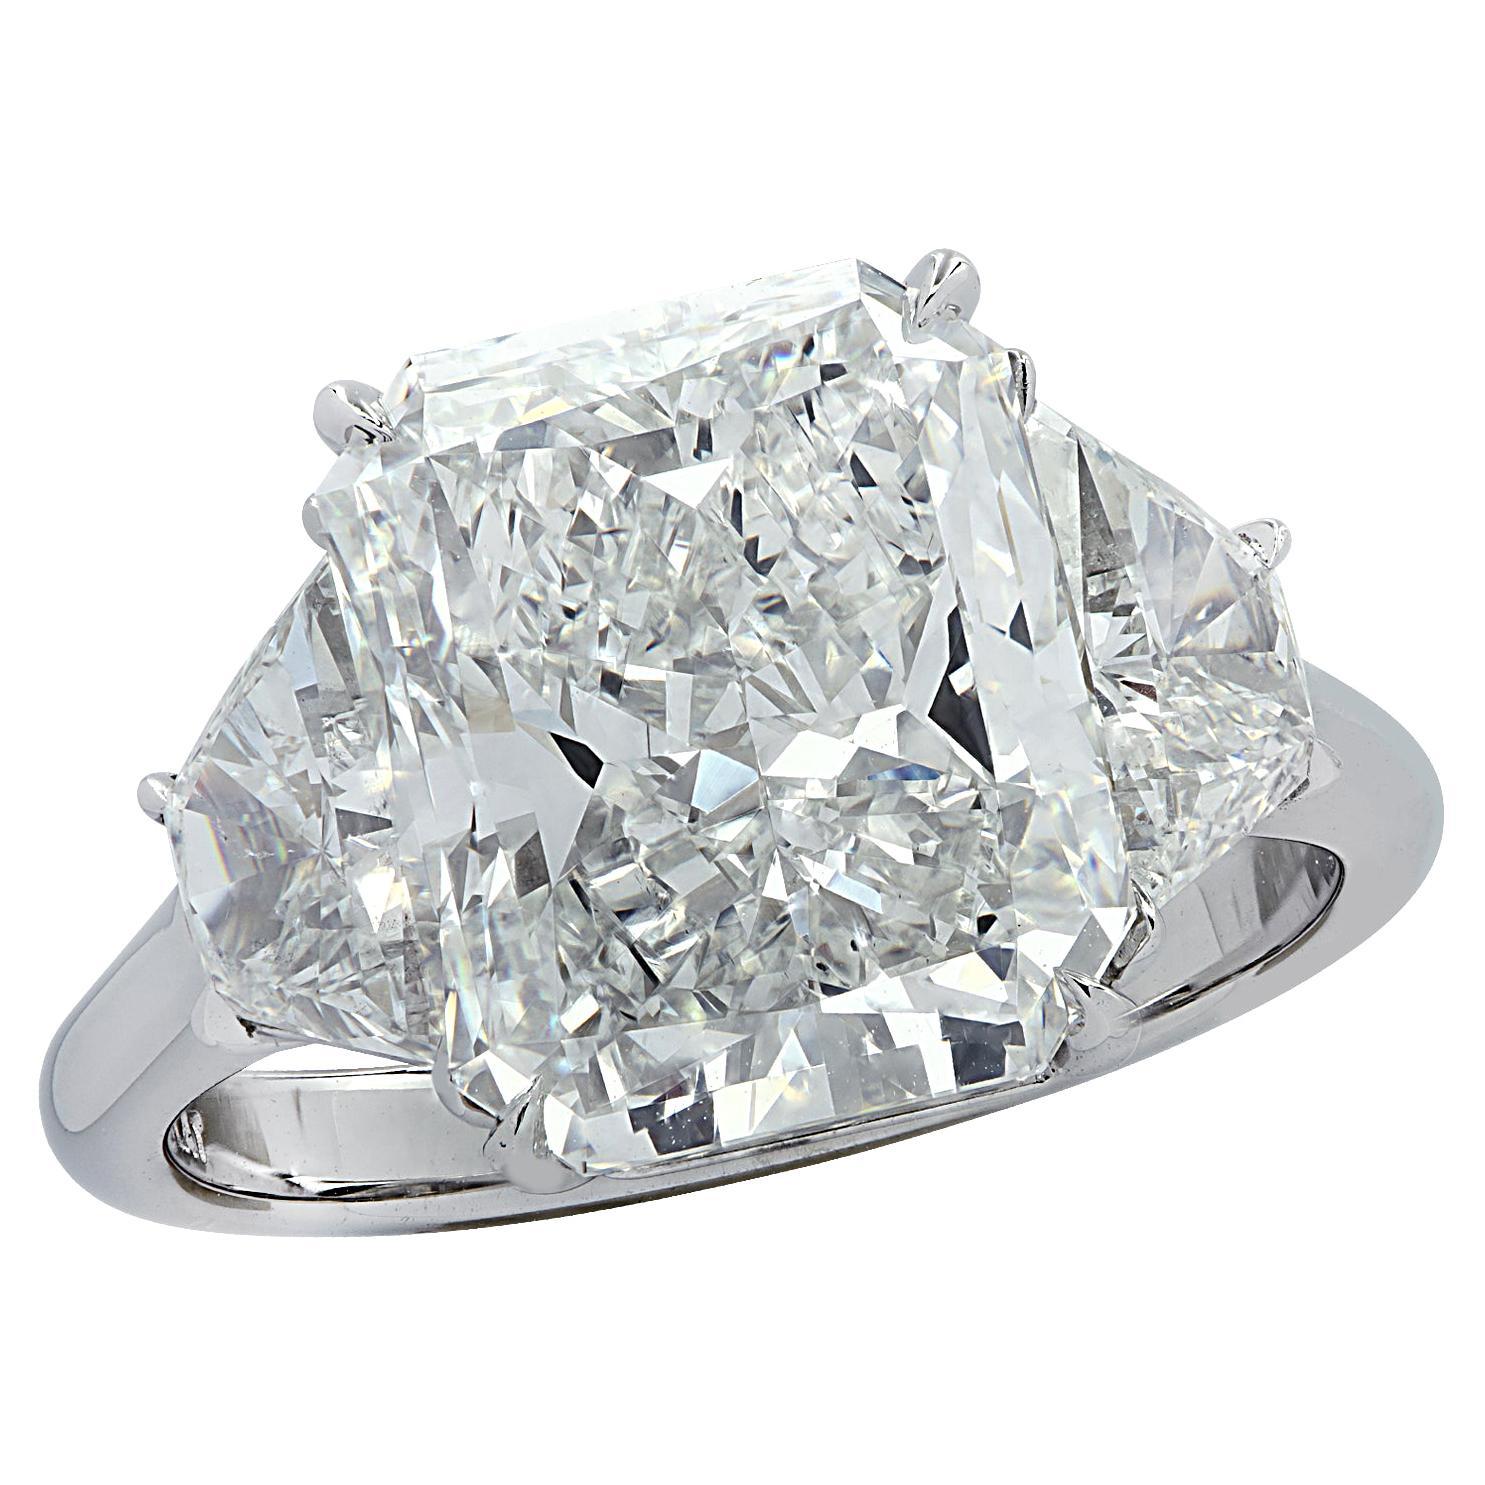 Vivid Diamonds GIA Certified 5.33 Carat Radiant Diamond Engagement Ring